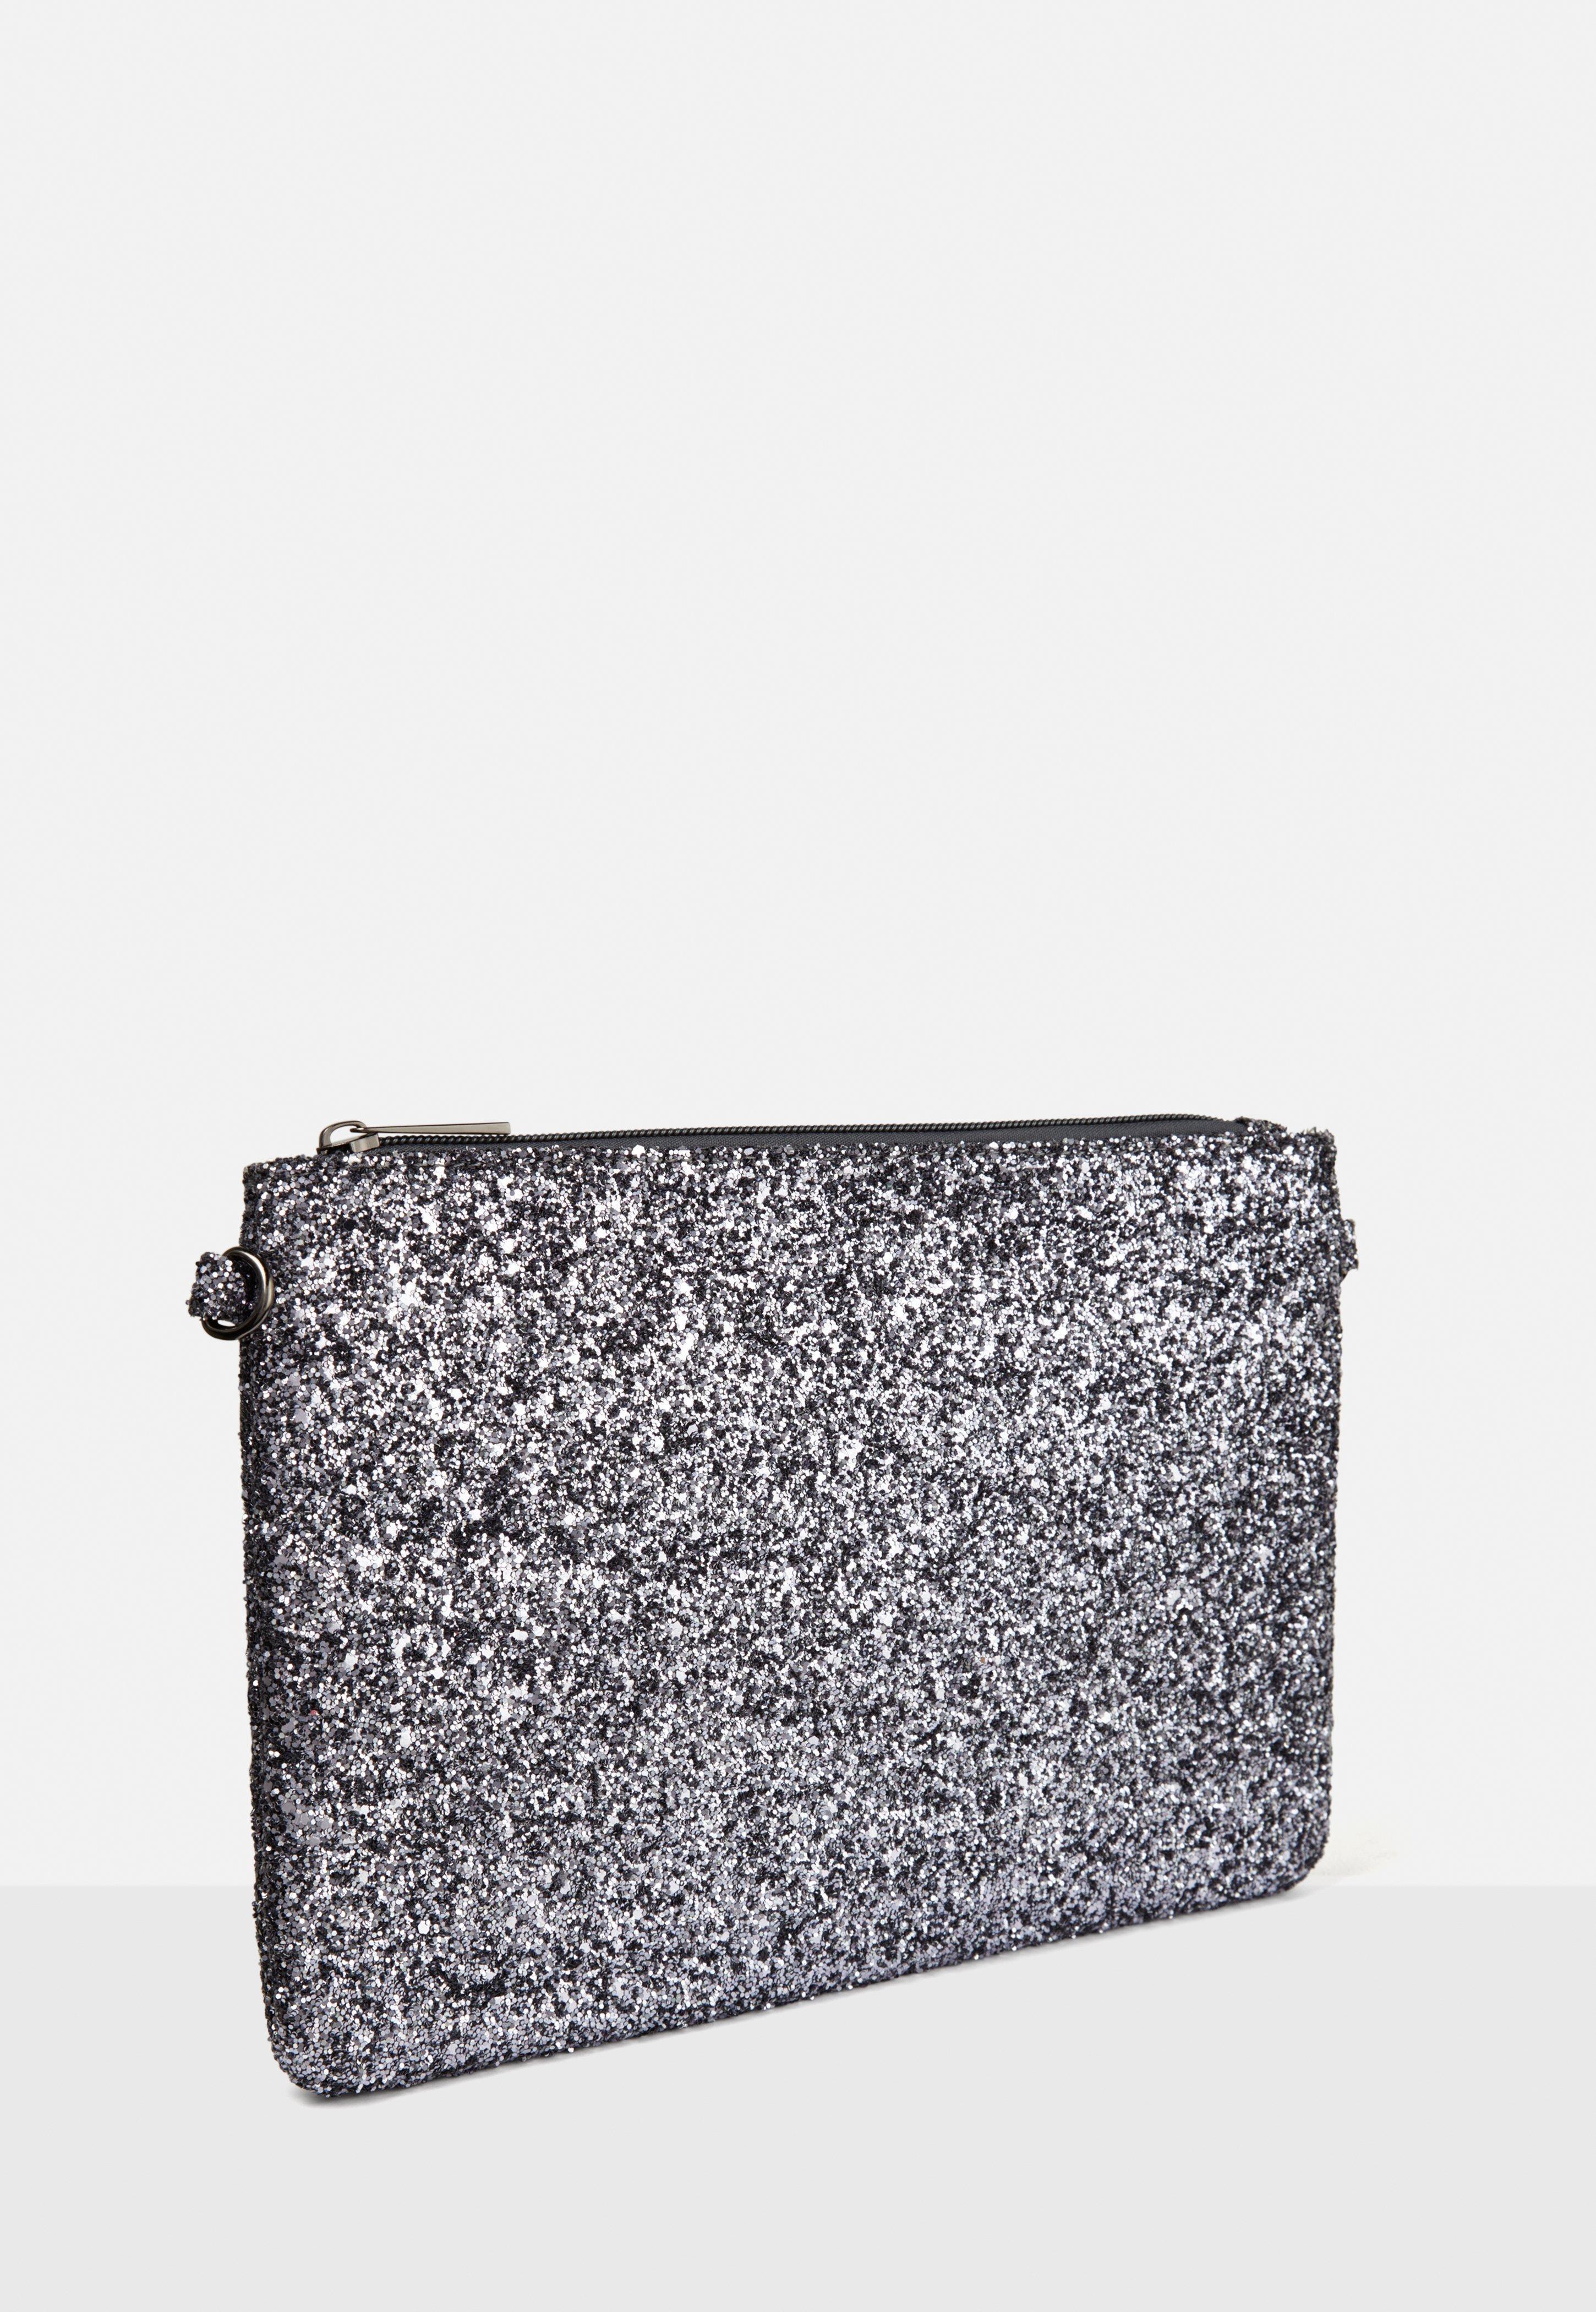 3a58cb2e59 ... Lyst - Missguided Silver Glitter Zip Top Clutch Bag in Metal on sale  4eea5 e65cd  Grey Faux Fur Roll ...